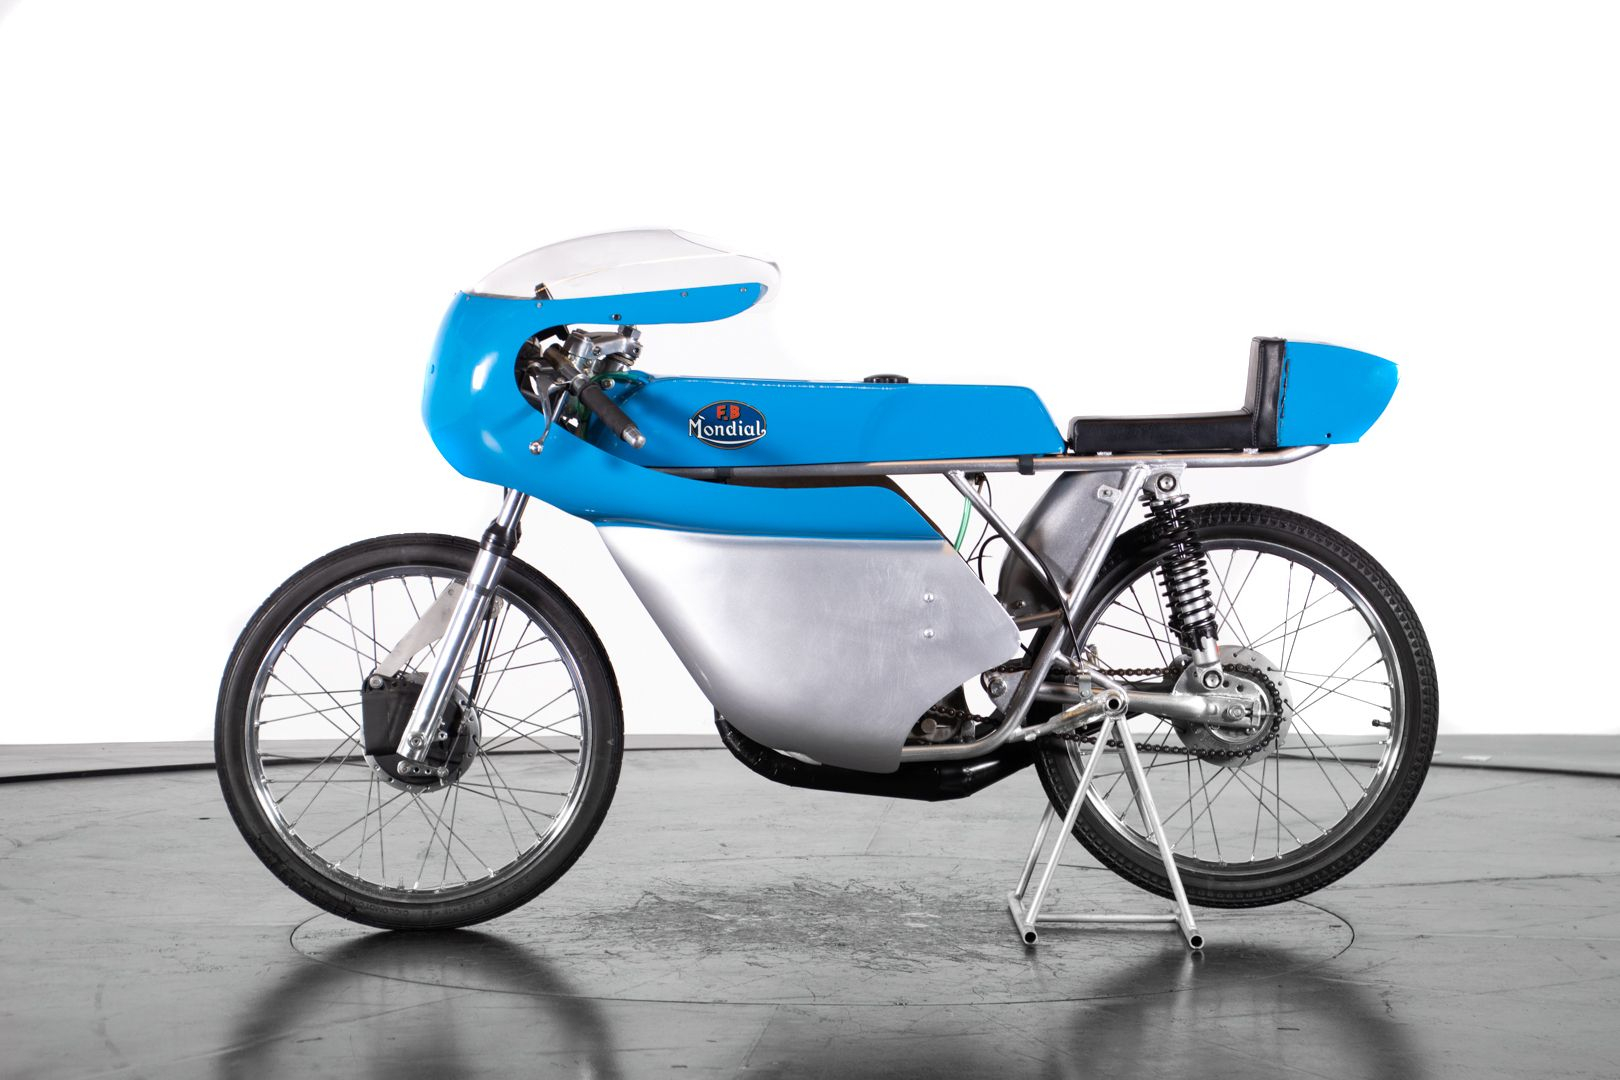 1968 MONDIAL CORSA UNICO ESEMPLARE 52047